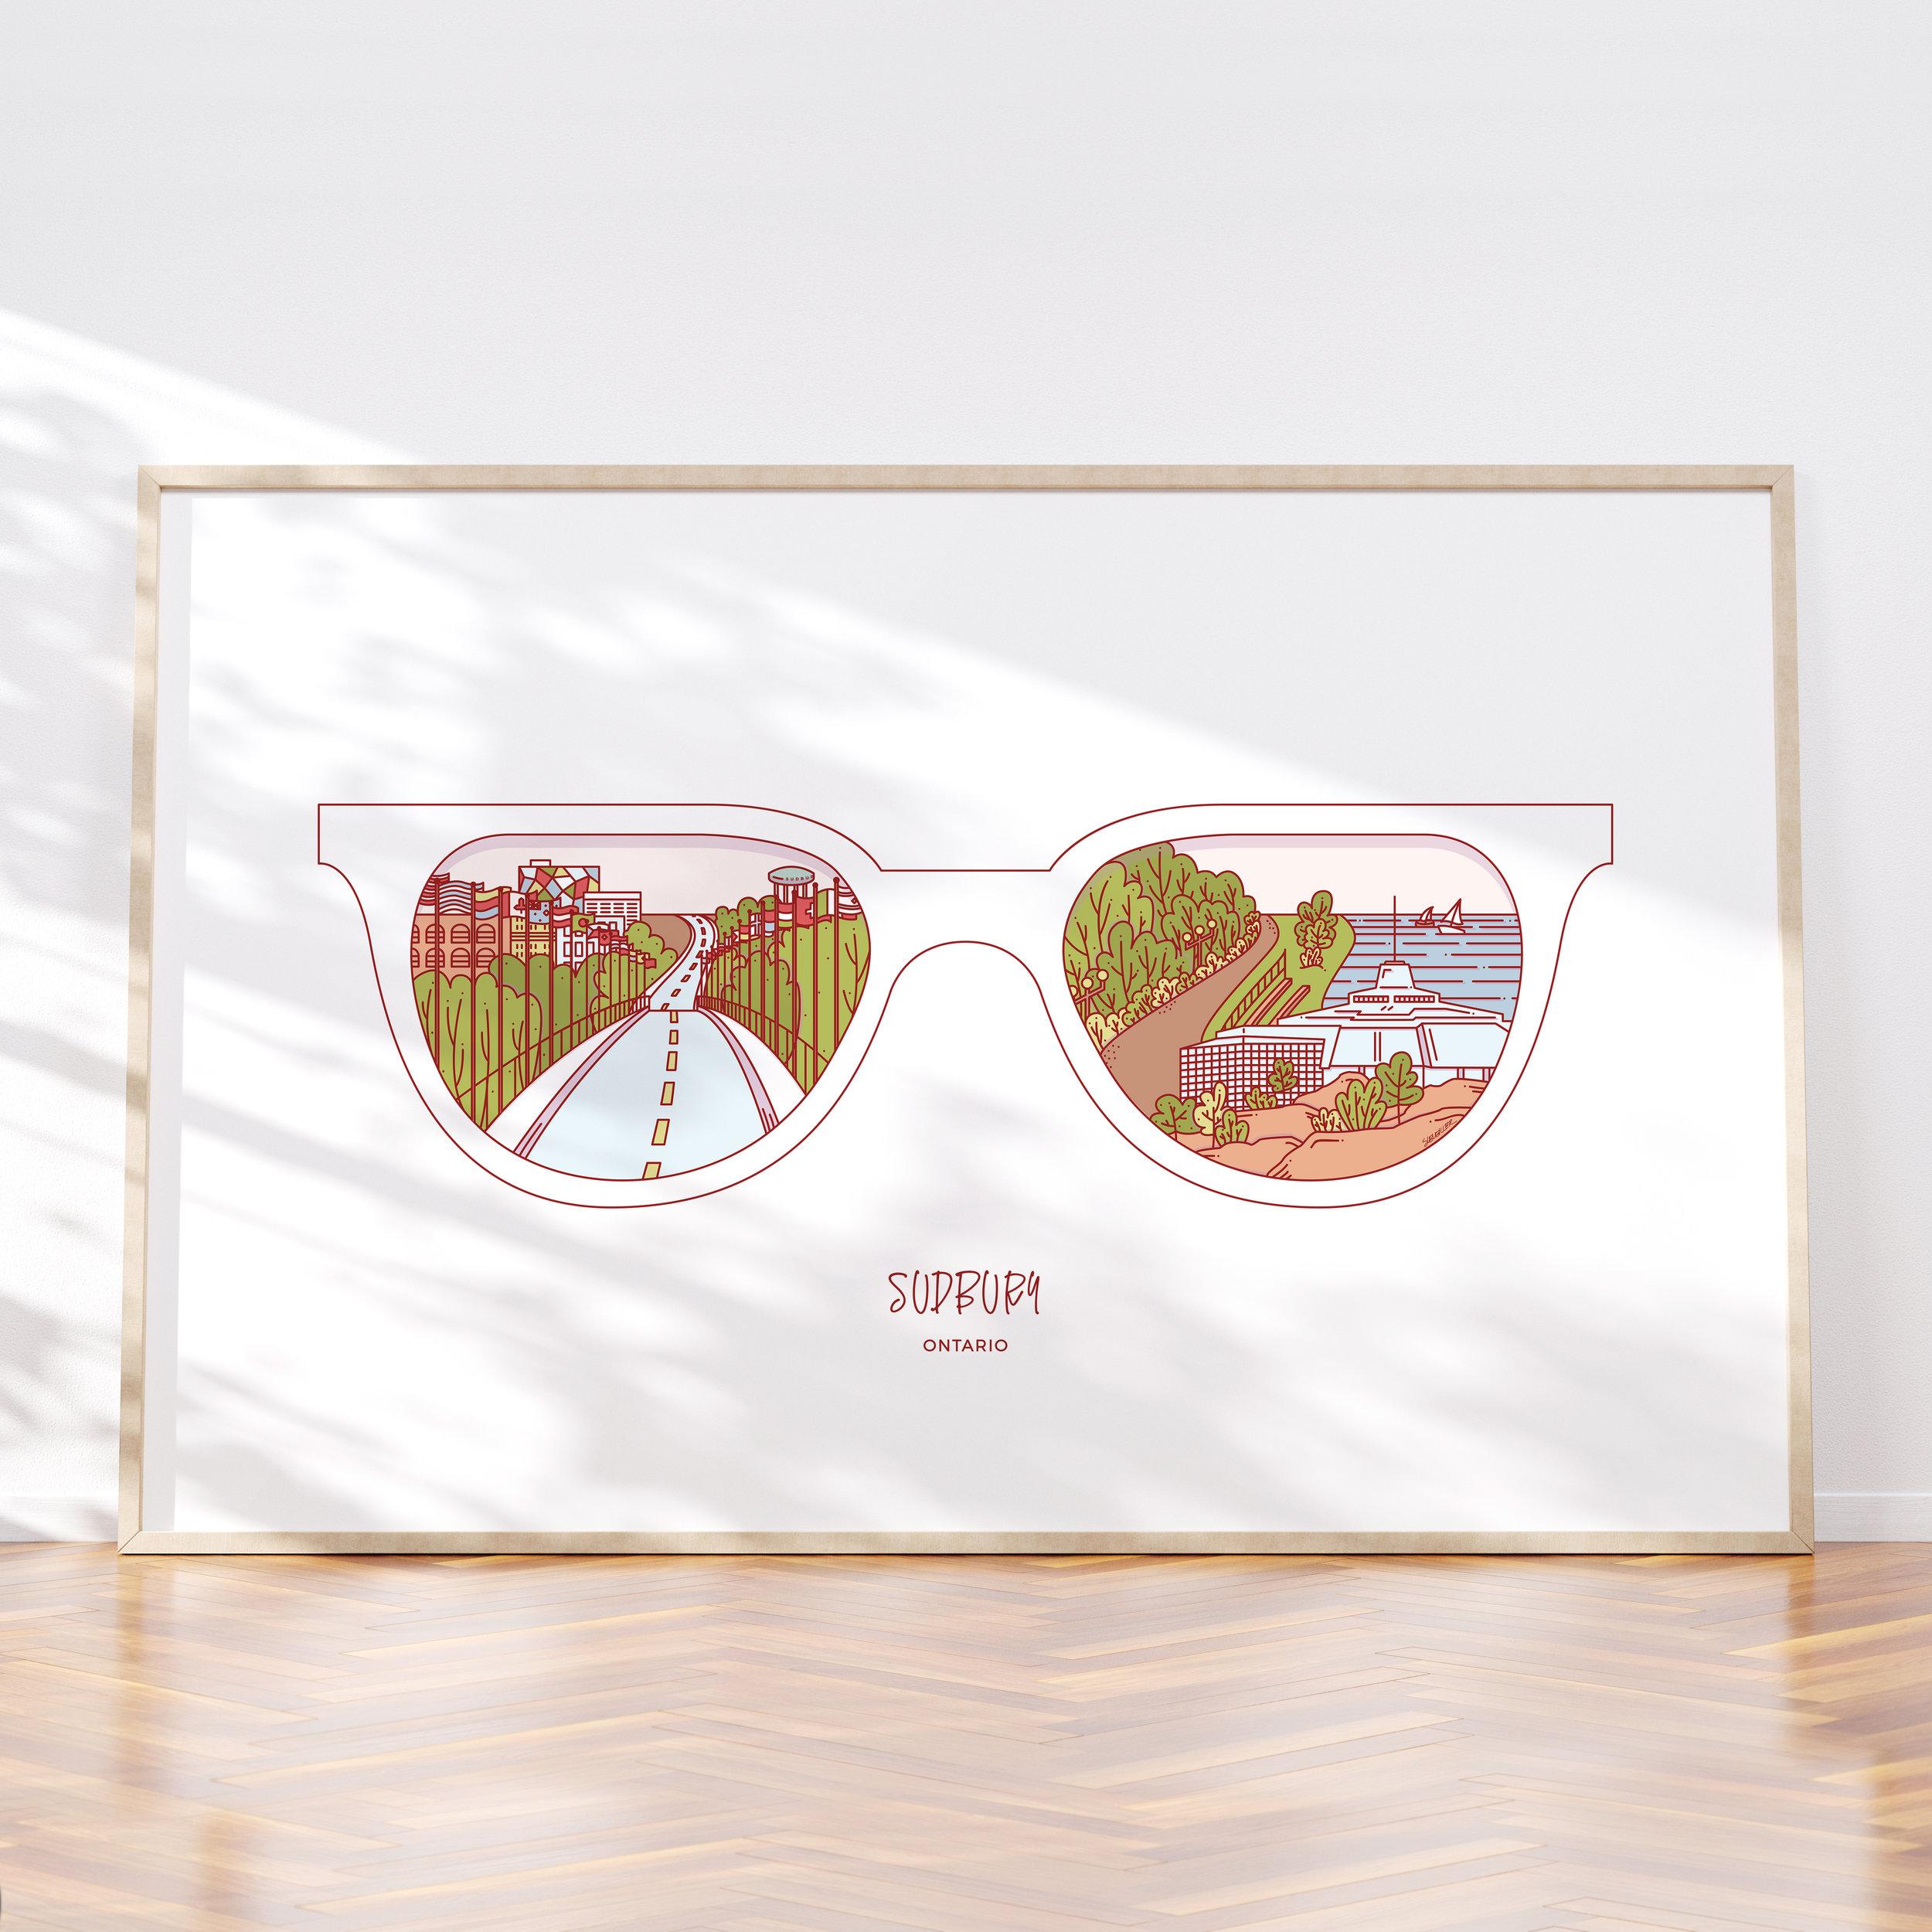 frame-mockup-SUDBURY.jpg